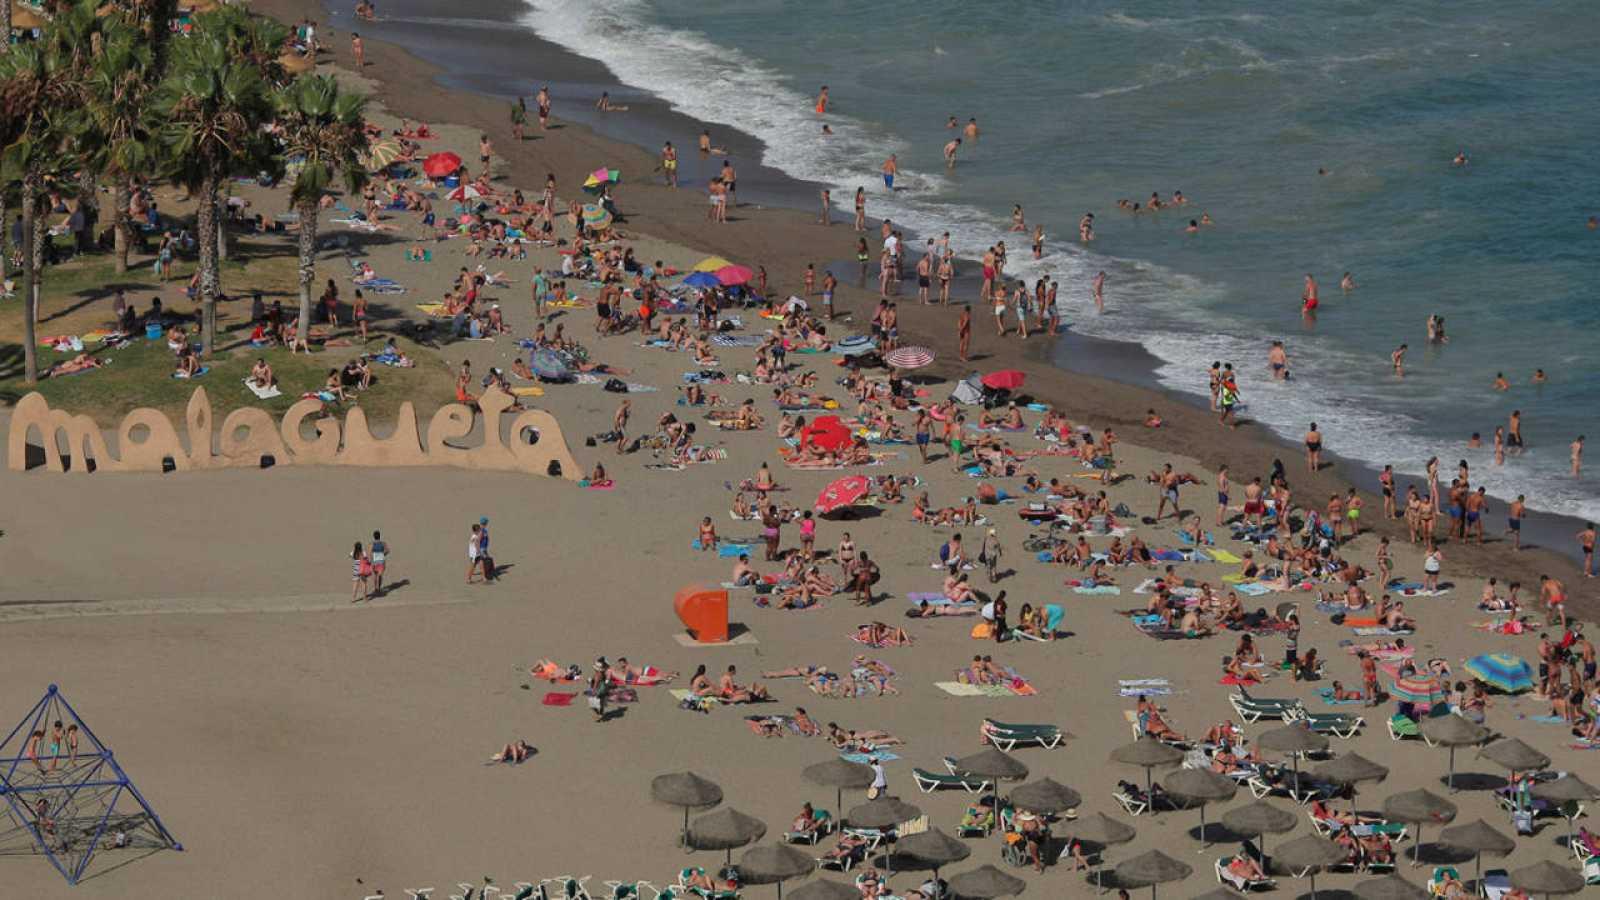 La playa de la Malagueta